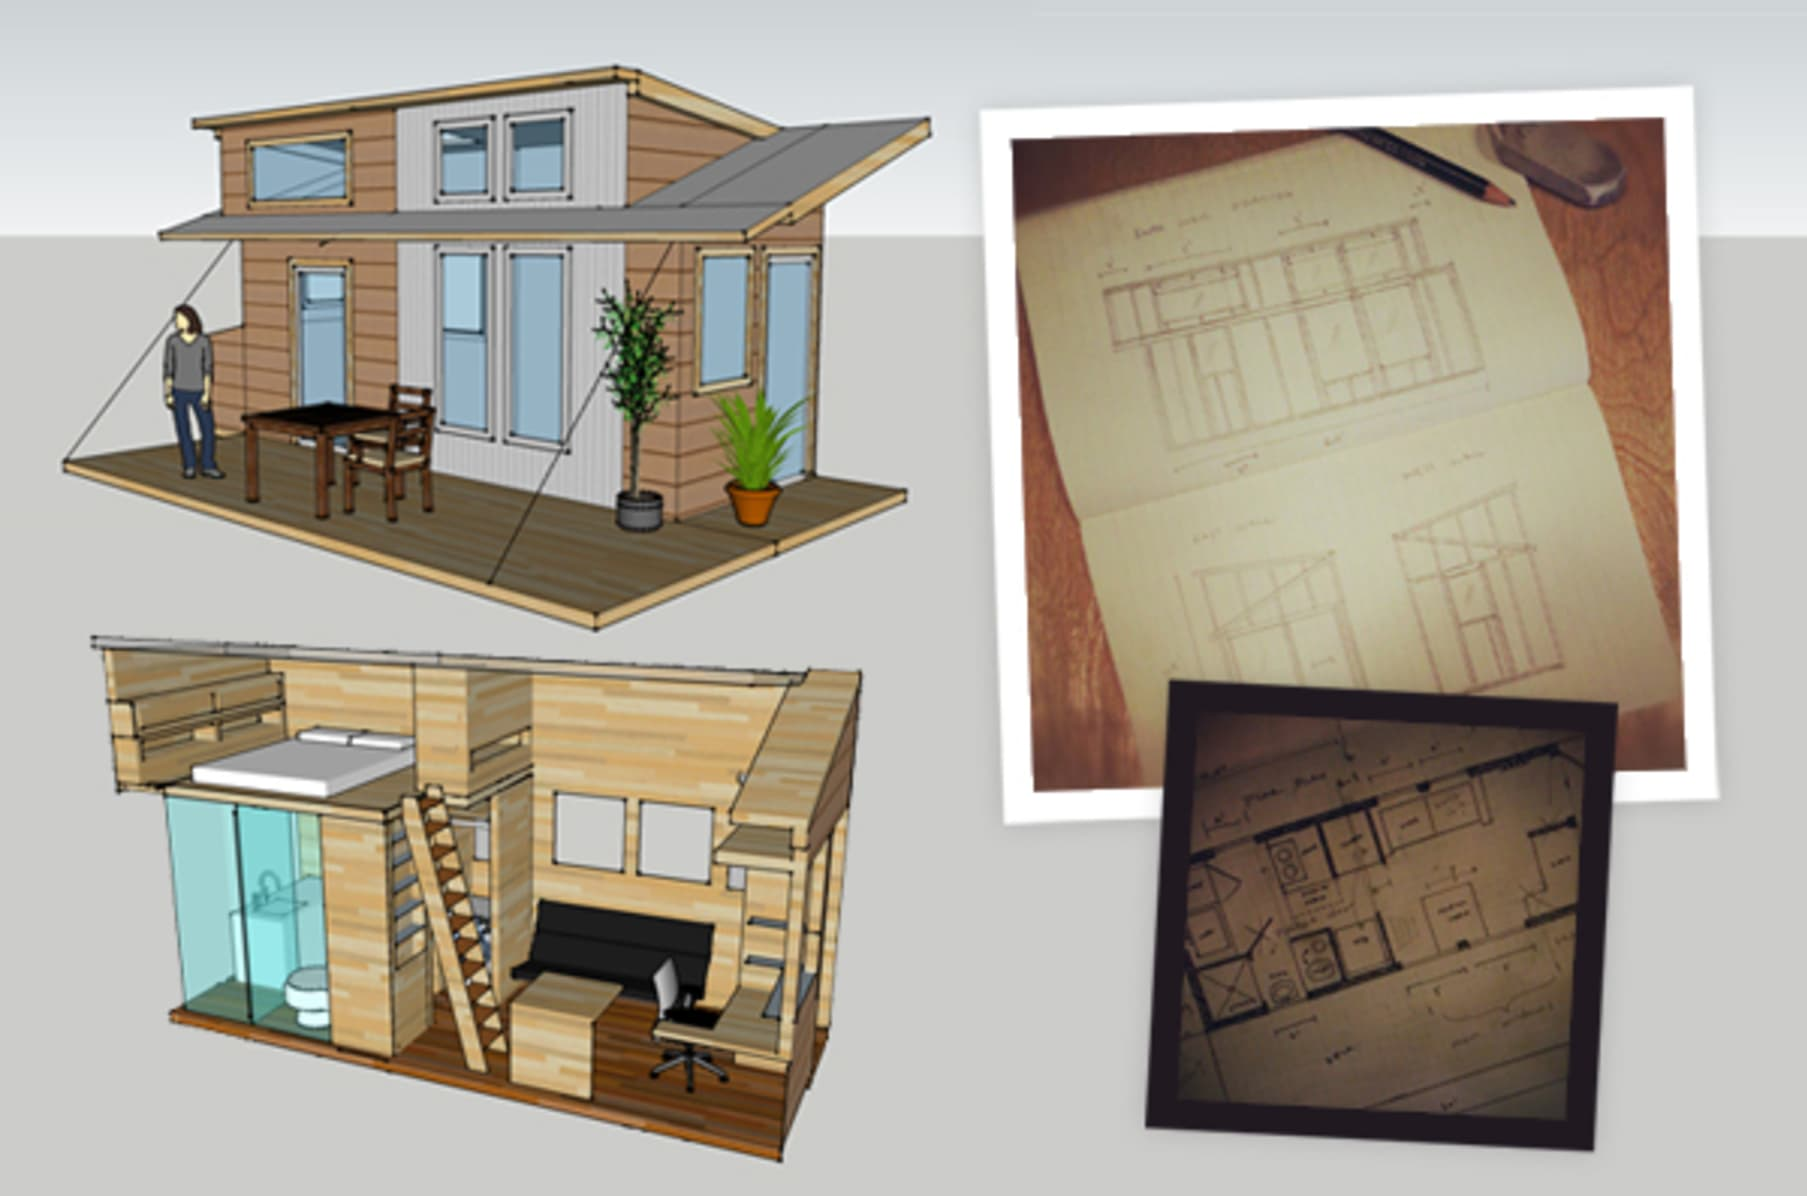 Alek Lisefski Tiny House the tiny project -- tiny house build -- community education